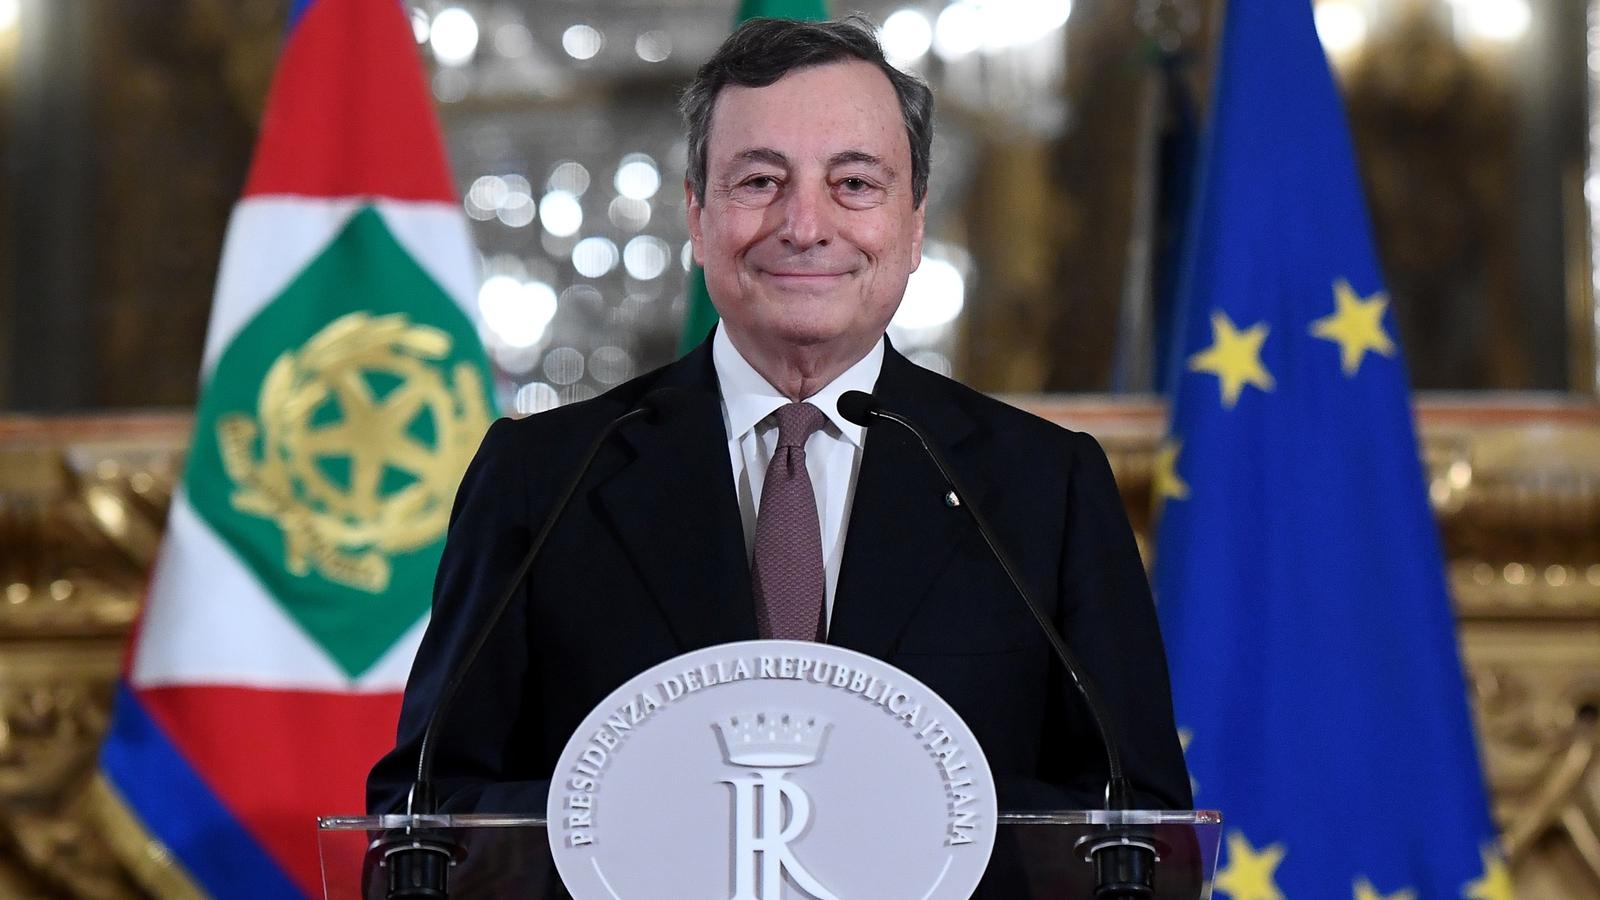 Draghi sets out plan to rebuild virus-hit Italy